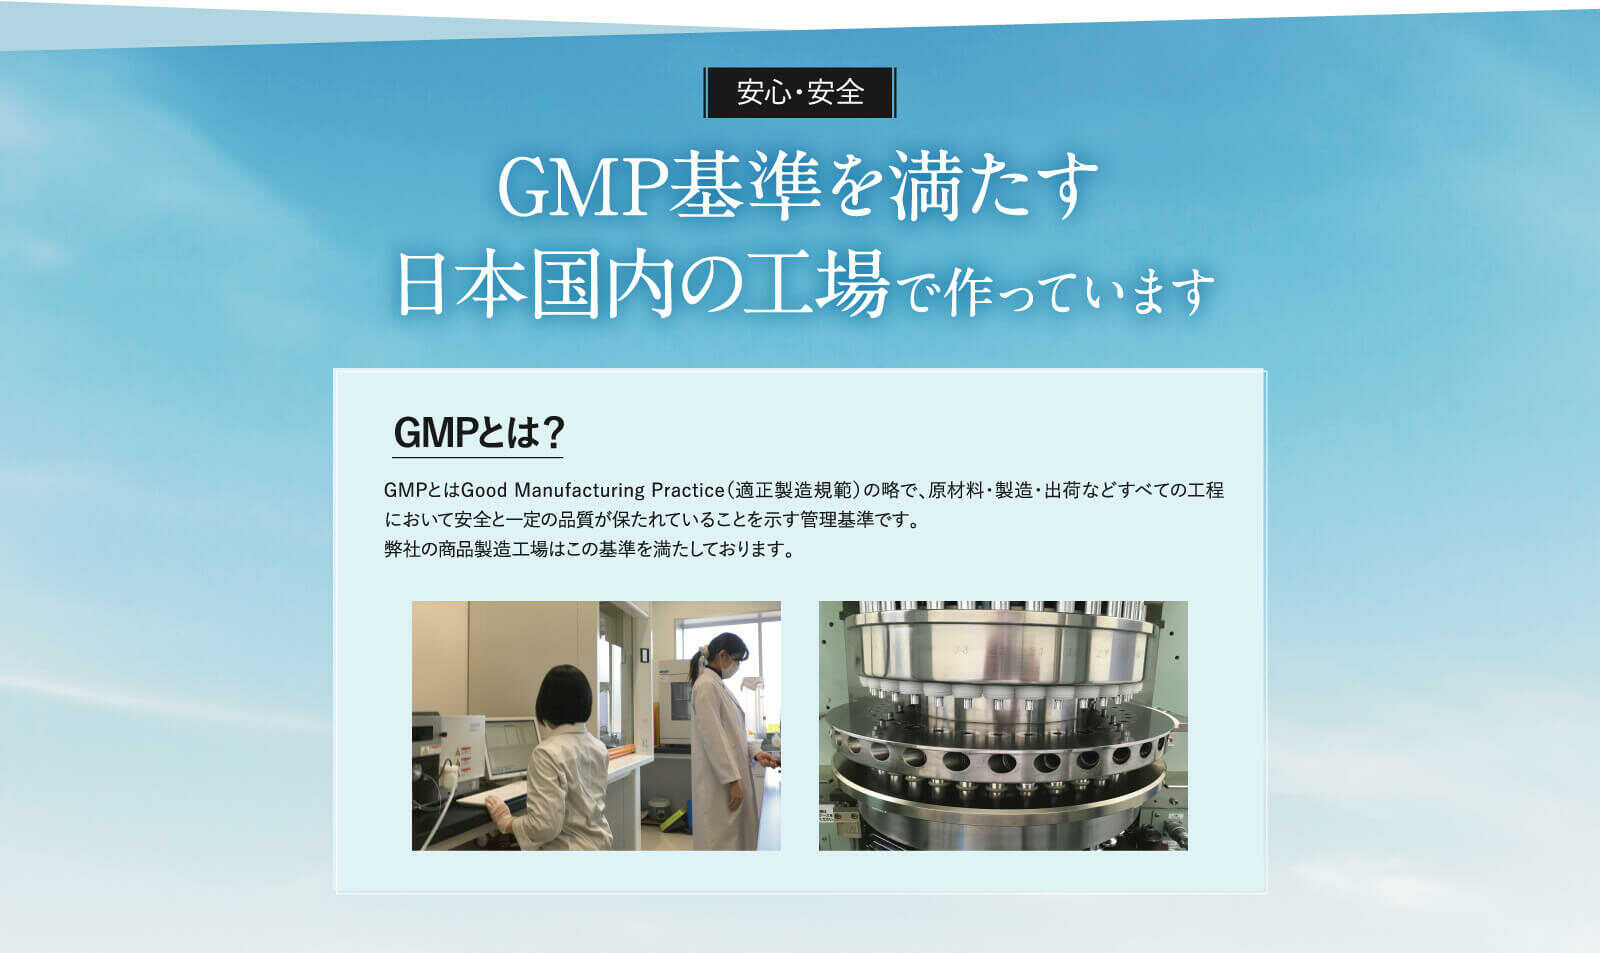 GMPを満たす工場で生産